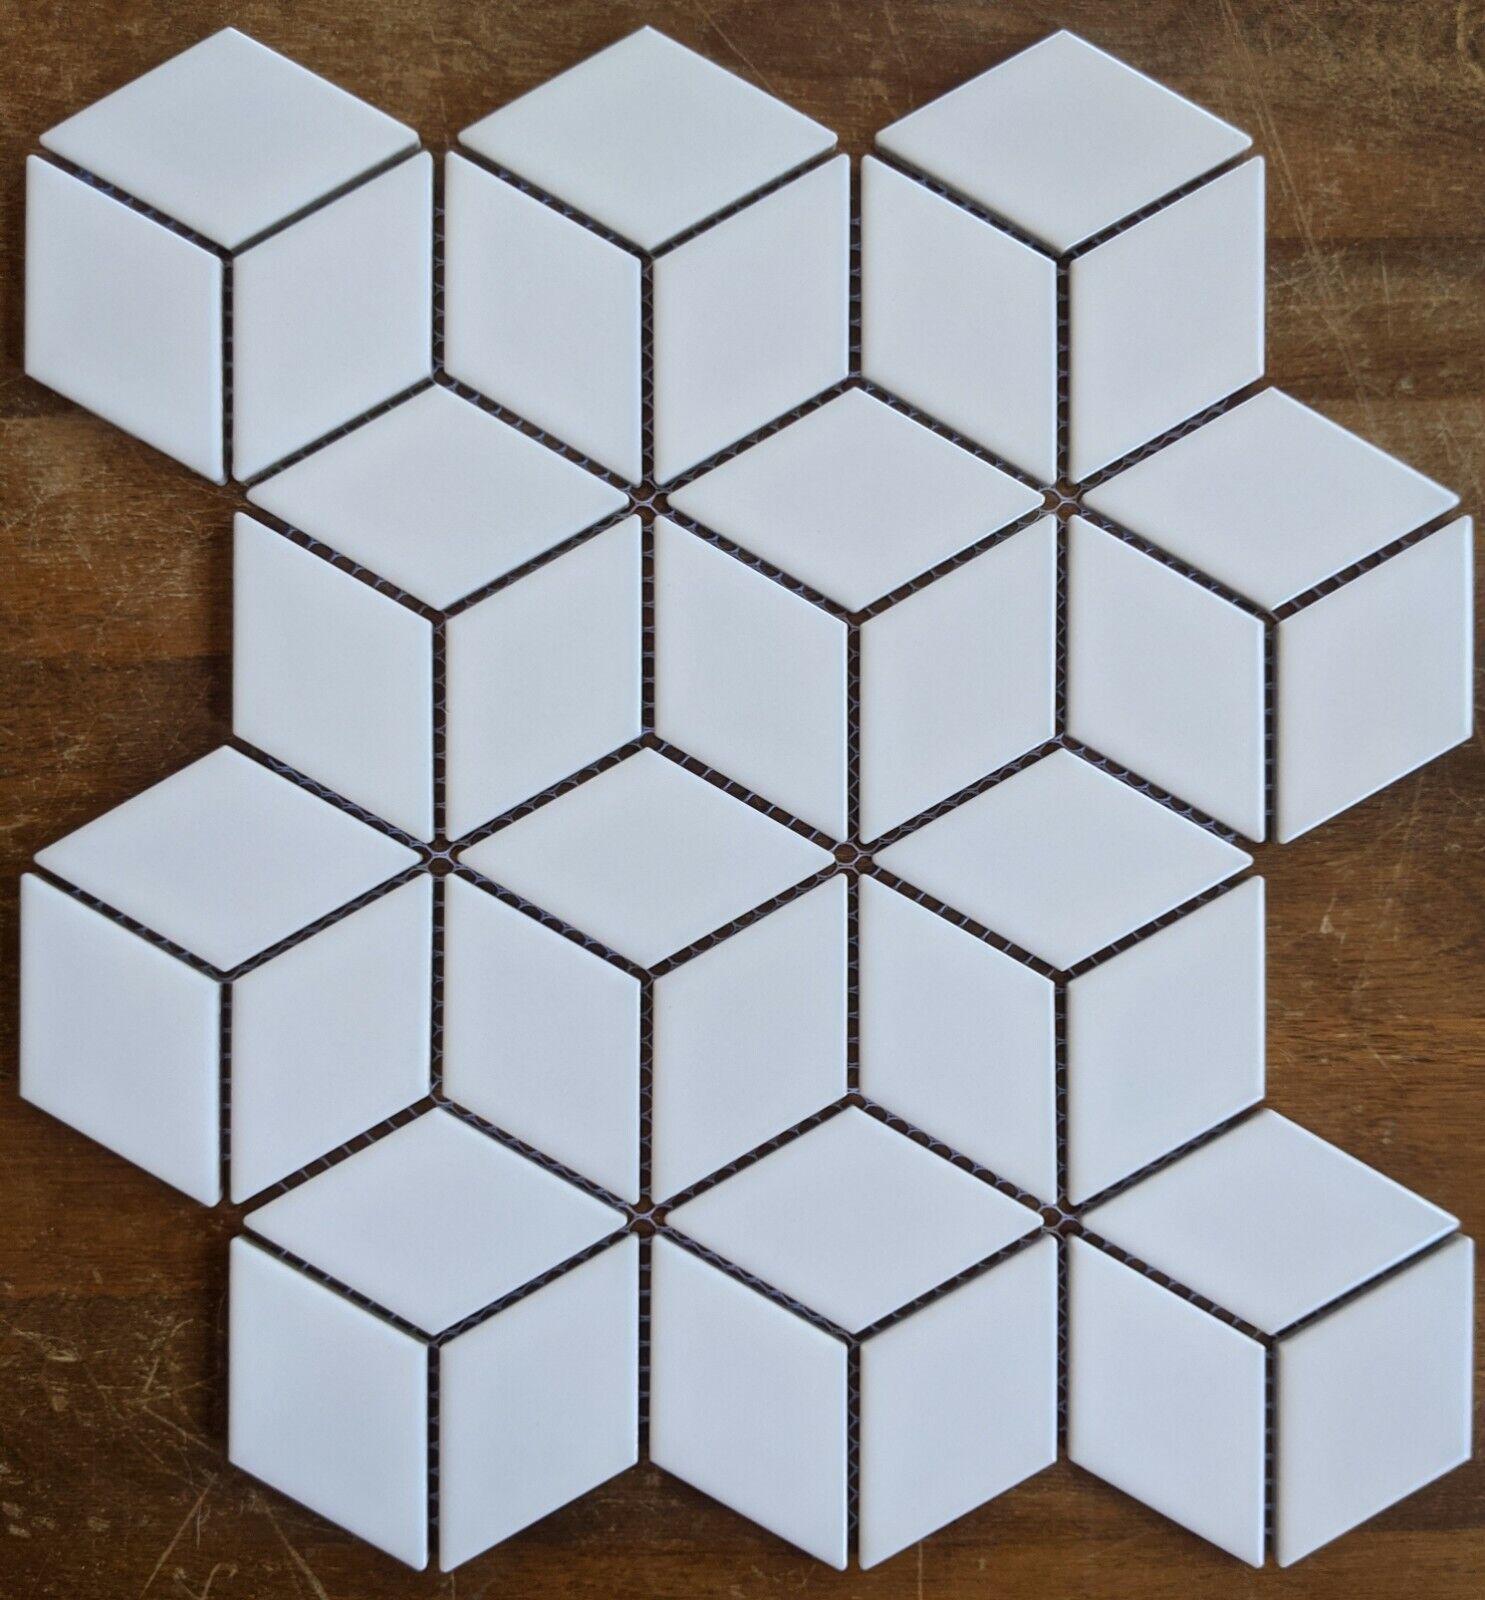 Matte White Diamond Cube Porcelain Mosaic For Wall And Floor Tile